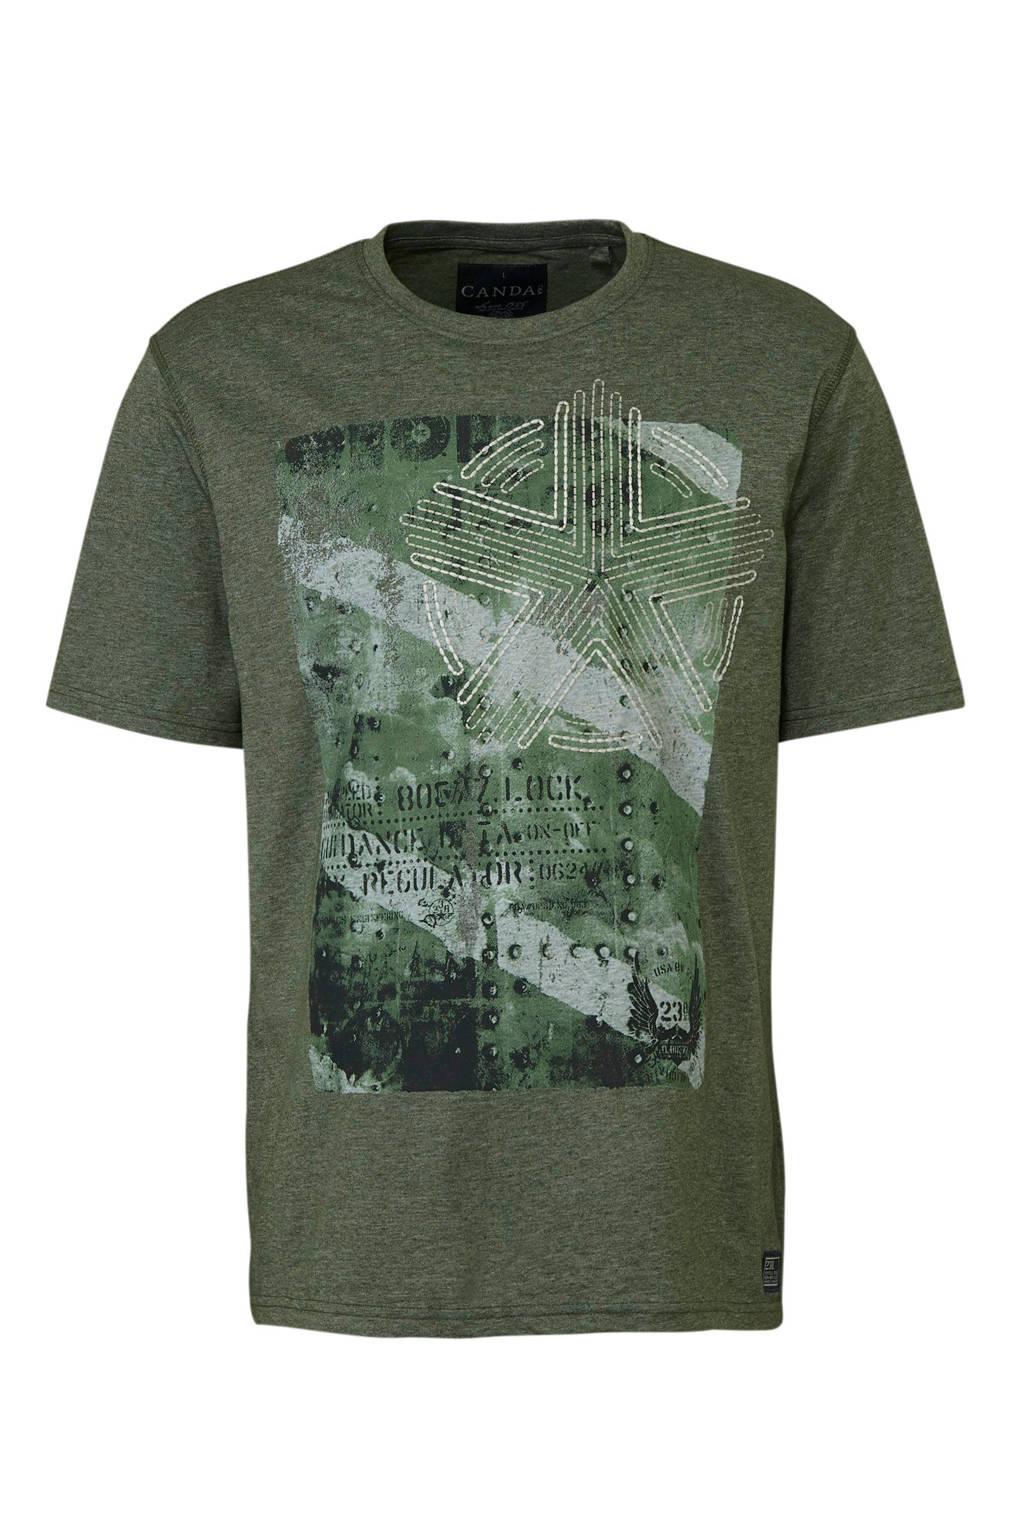 C&A Canda T-shirt, Khaki groen